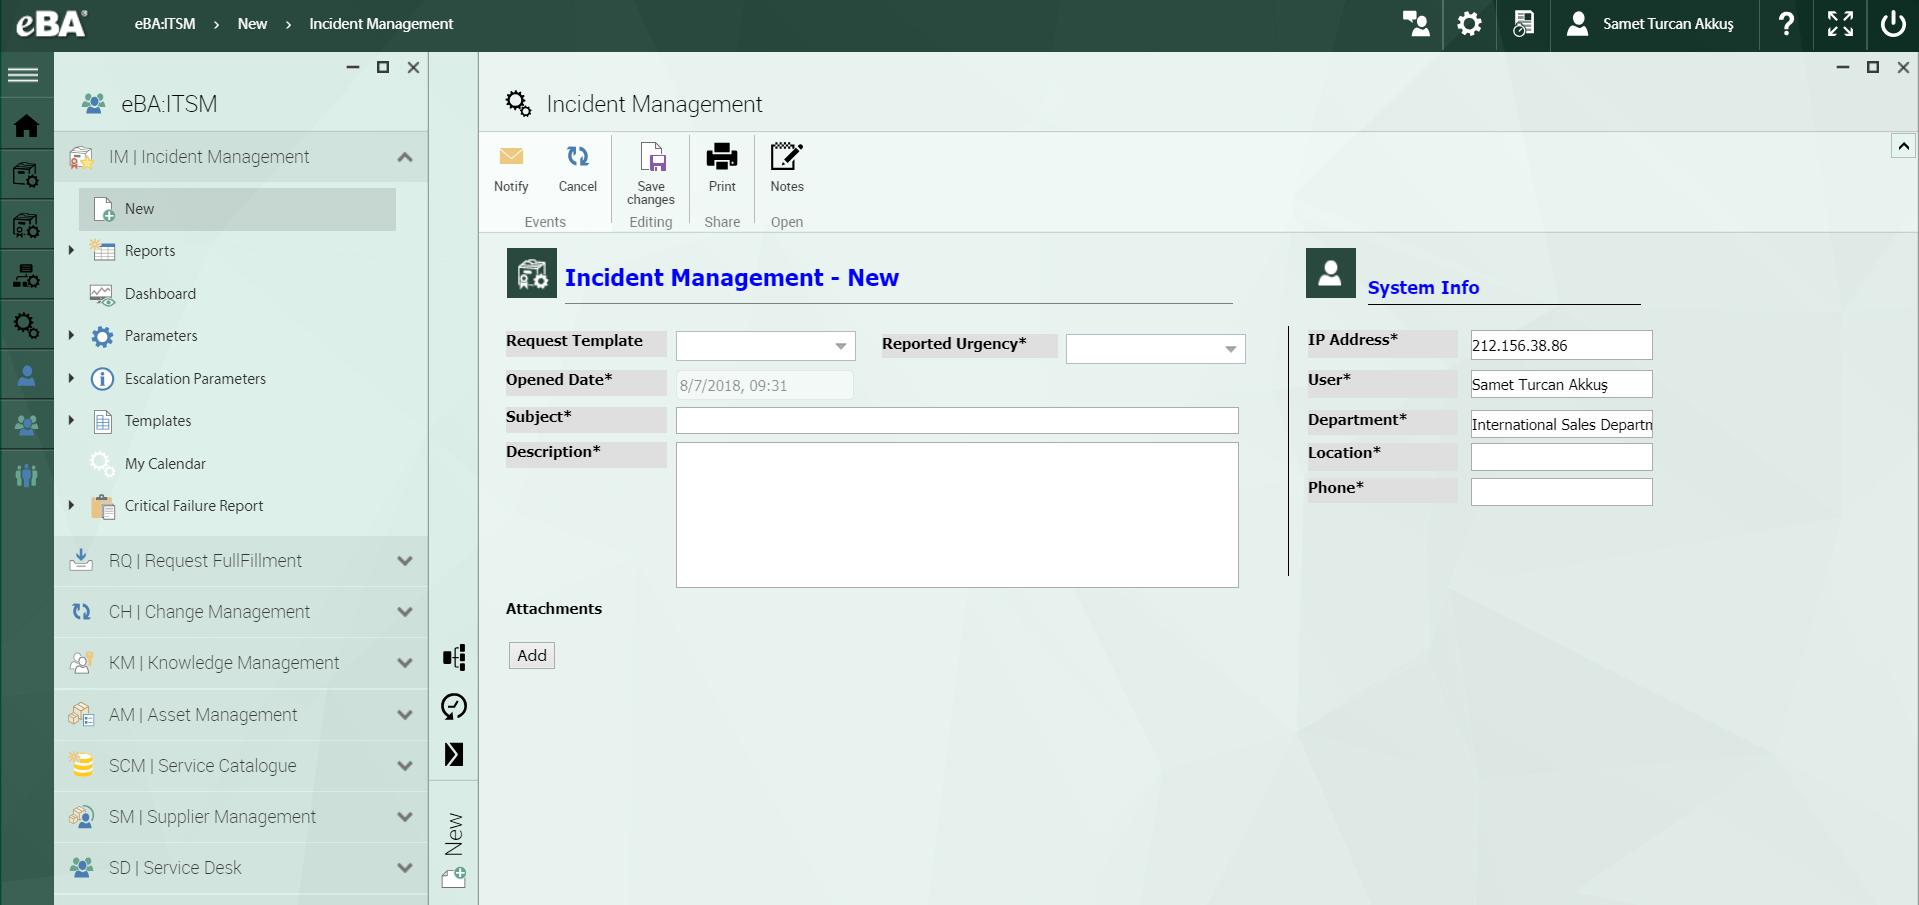 eBA ITSM Software - Incident management